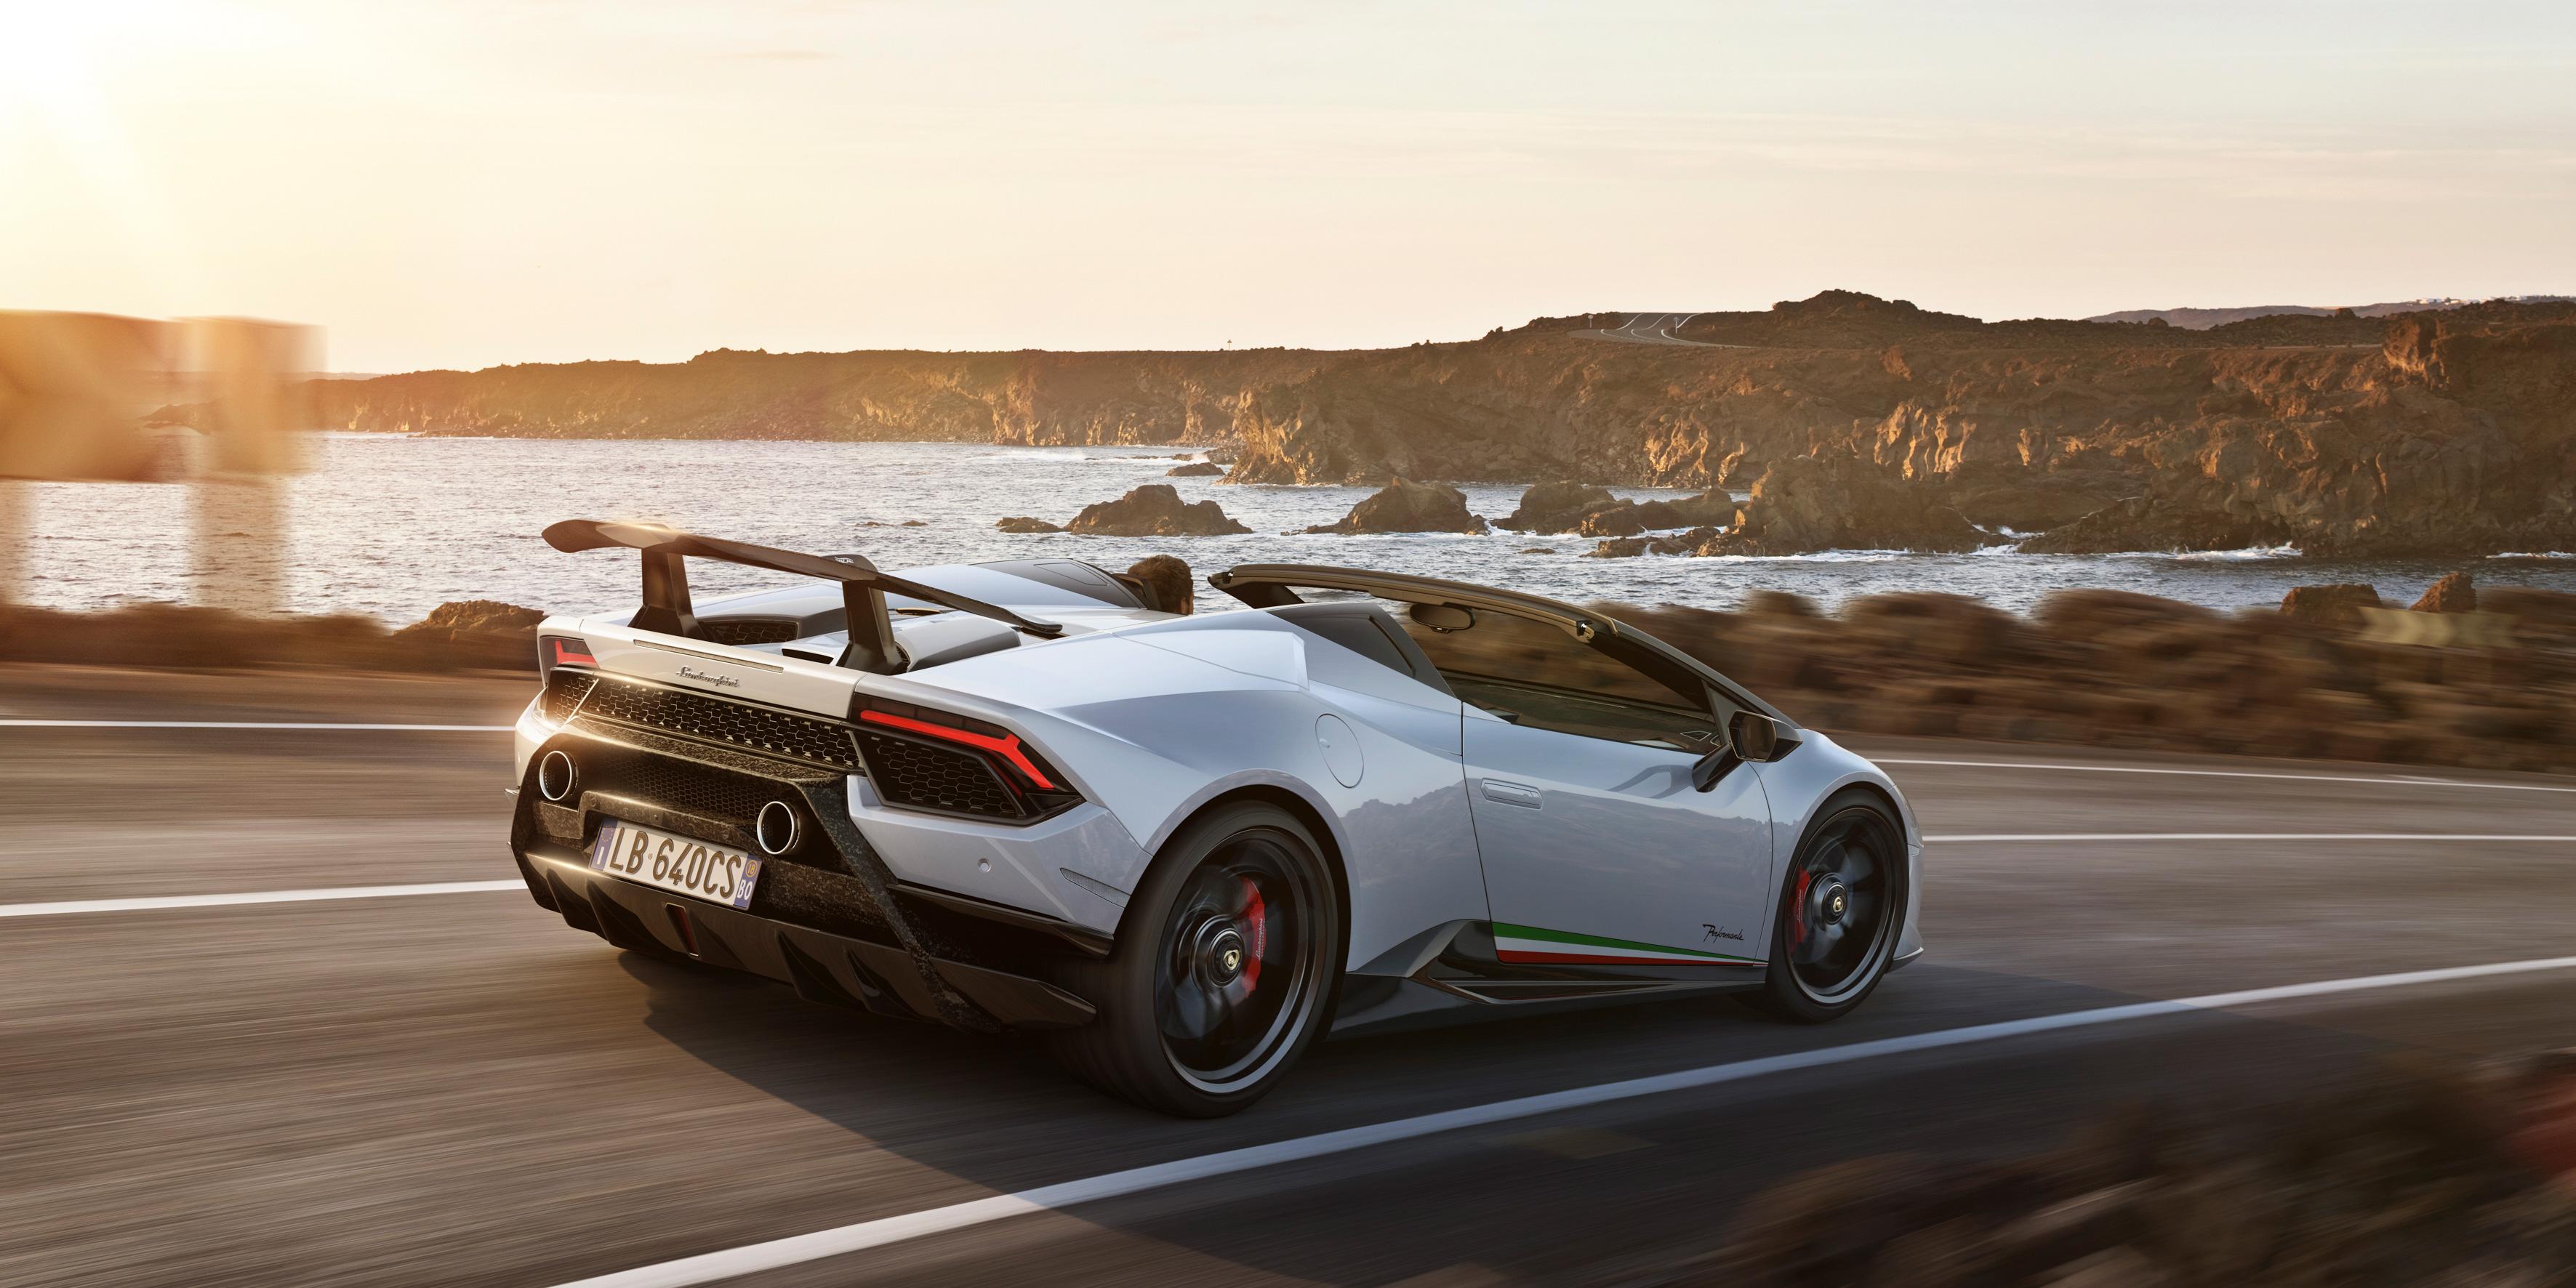 White Lamborghini Huracan Perfomante Spyder Rear 2018 Hd Cars 4k